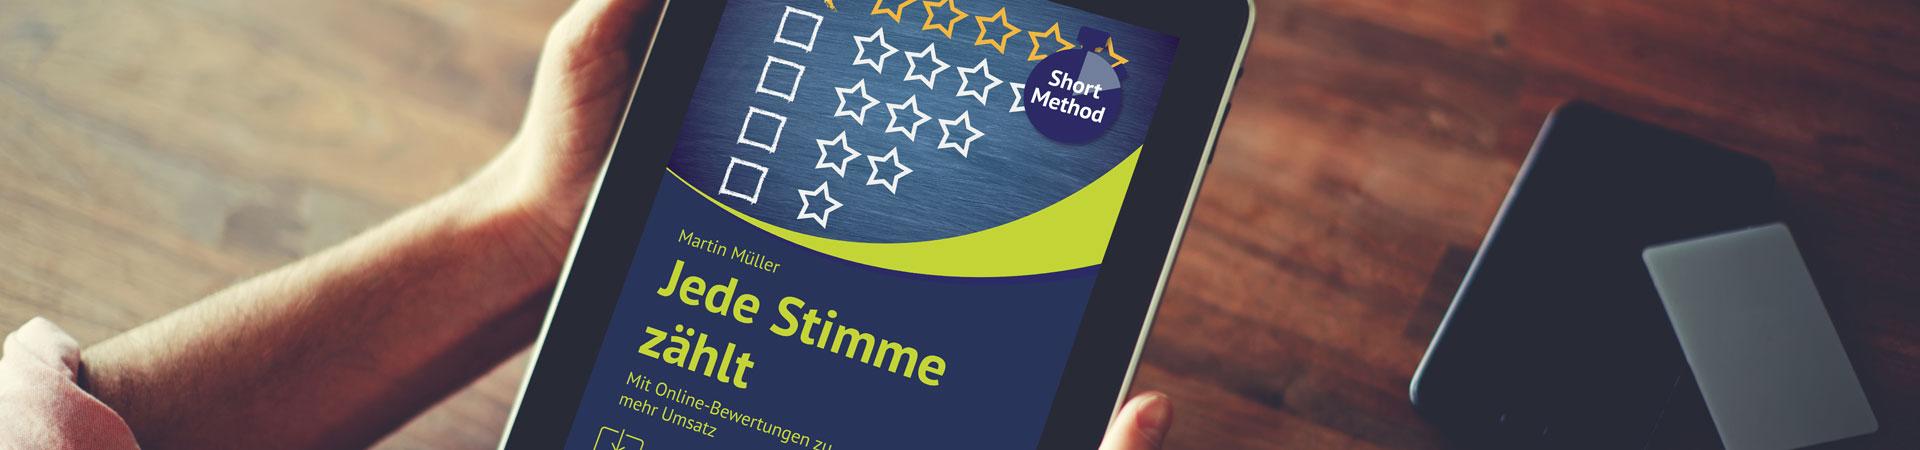 "E-Book-Review: ""Jede Stimme zählt"" von Networking-Profi Martin Müller"